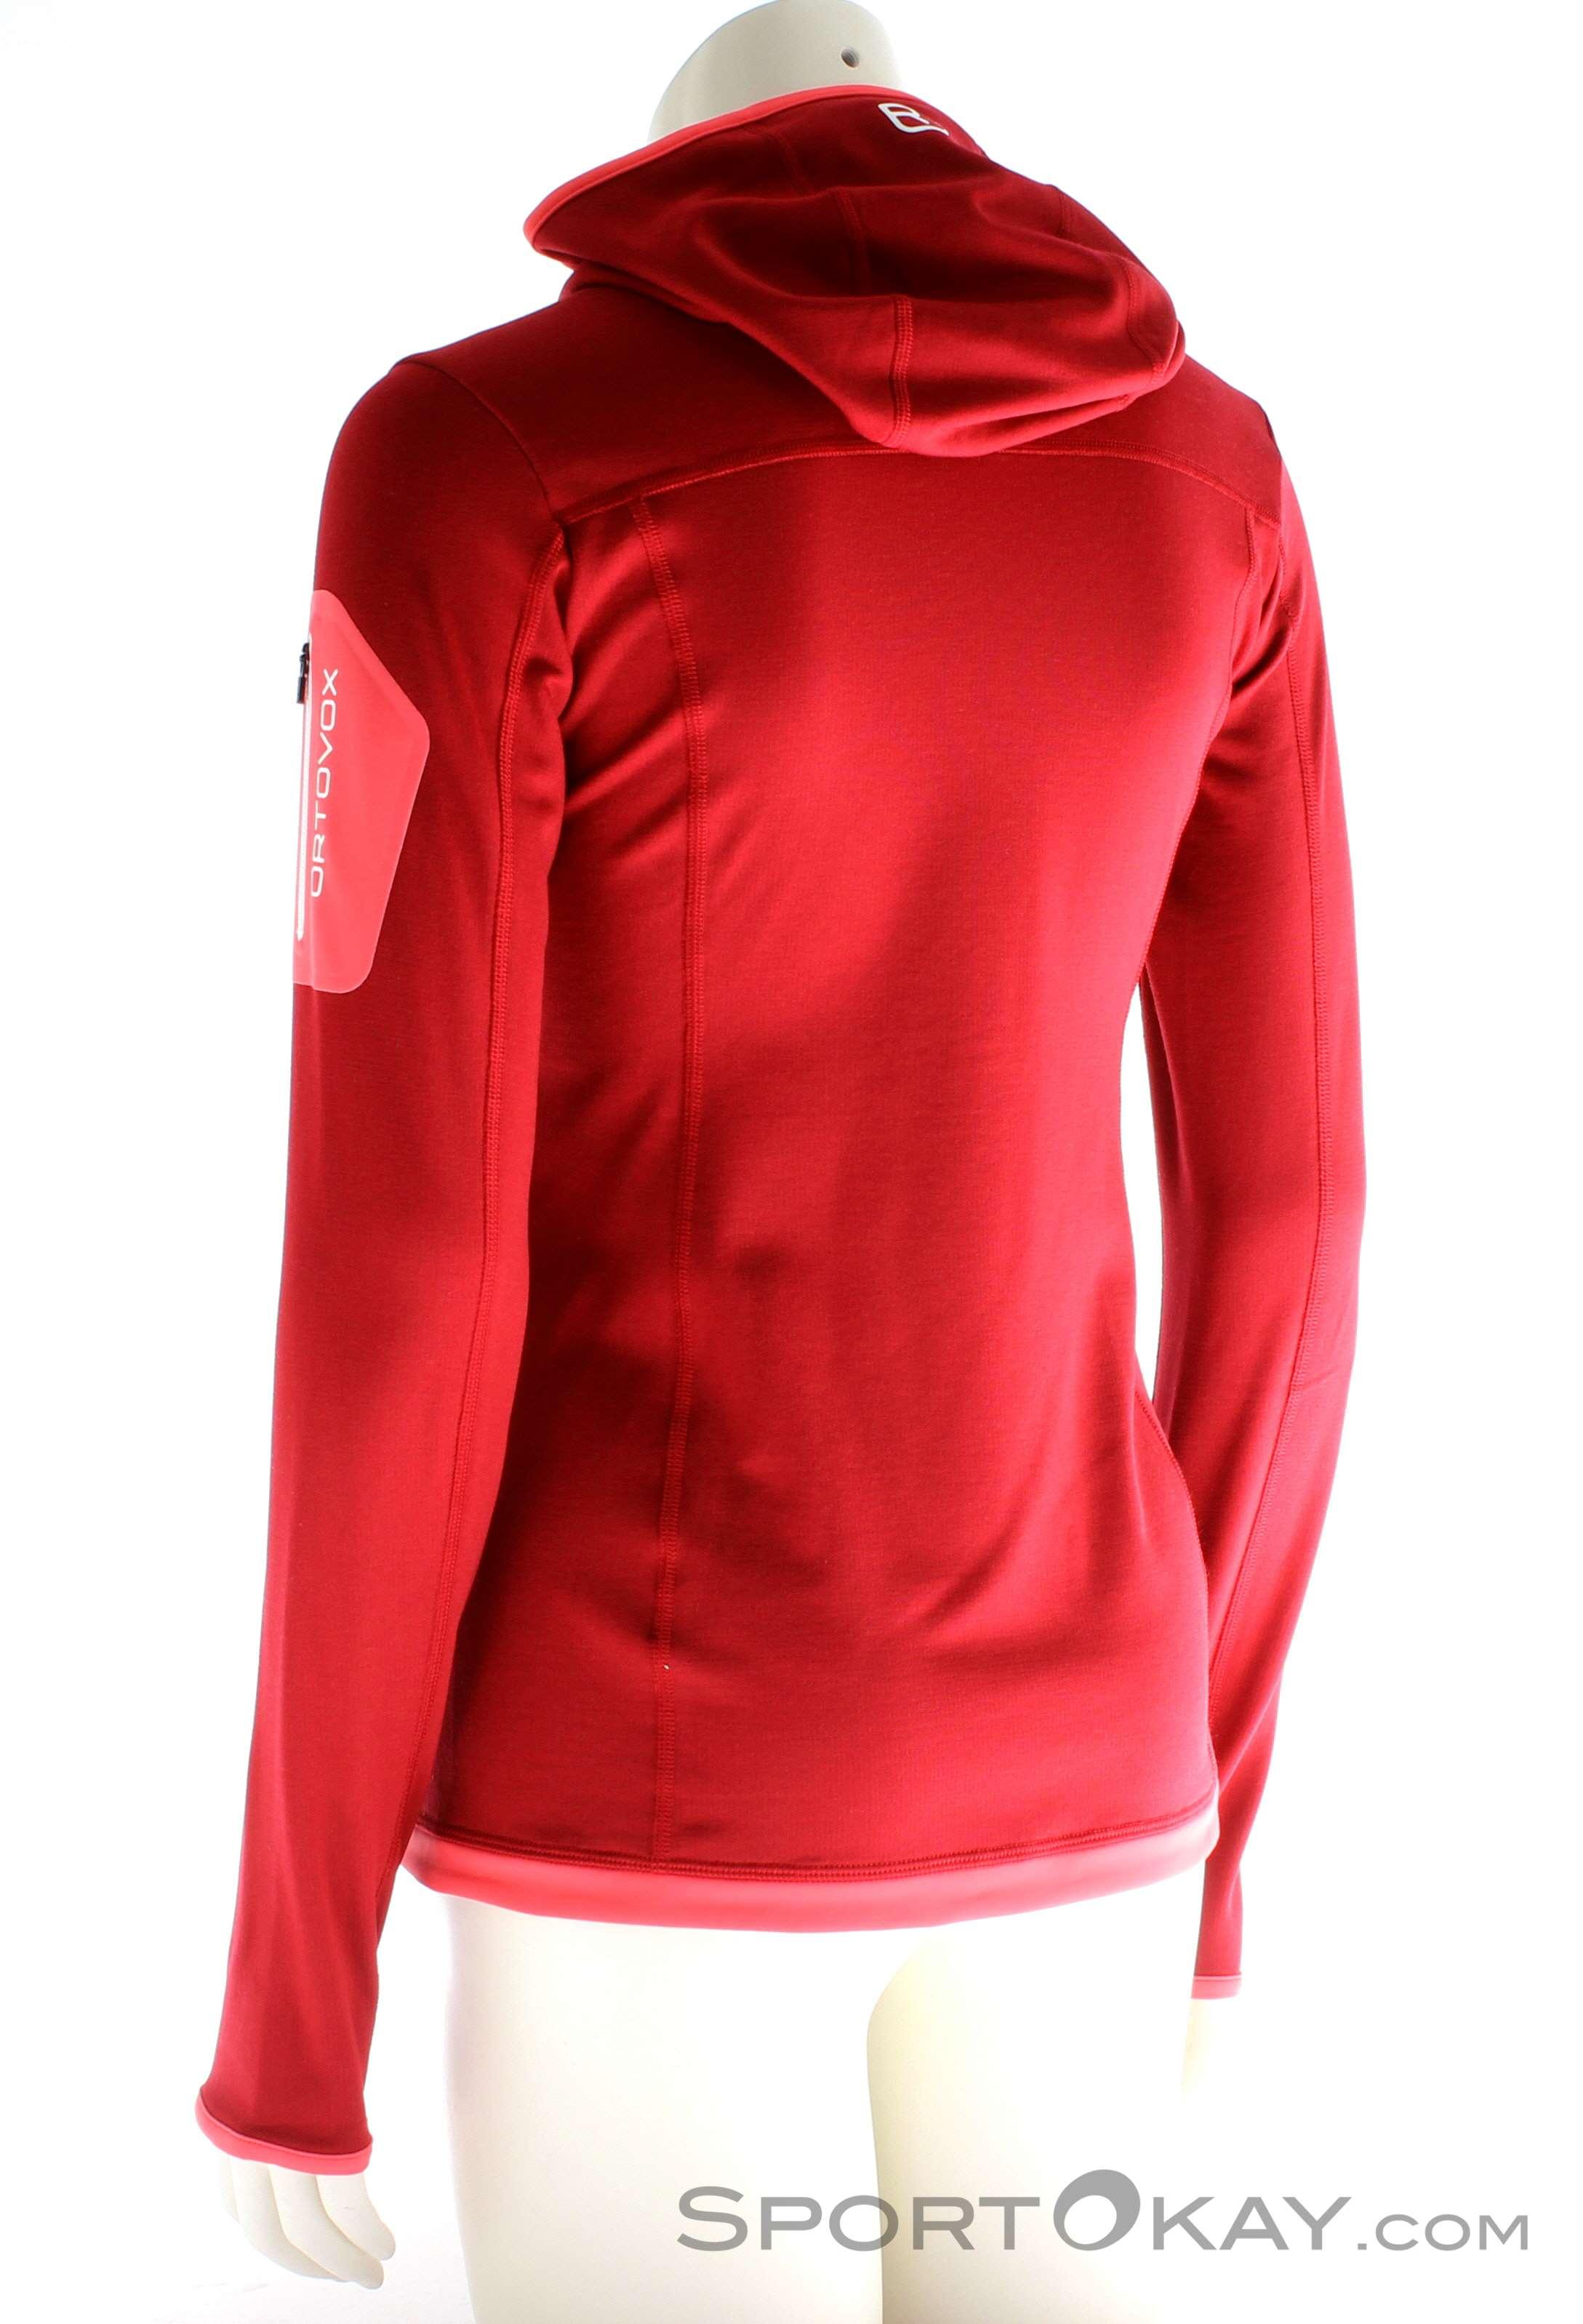 Ortovox Fleece Light Hoody Damen Outdoorsweater, Ortovox, Rot, , Damen,  0016- 75ad91b2f9